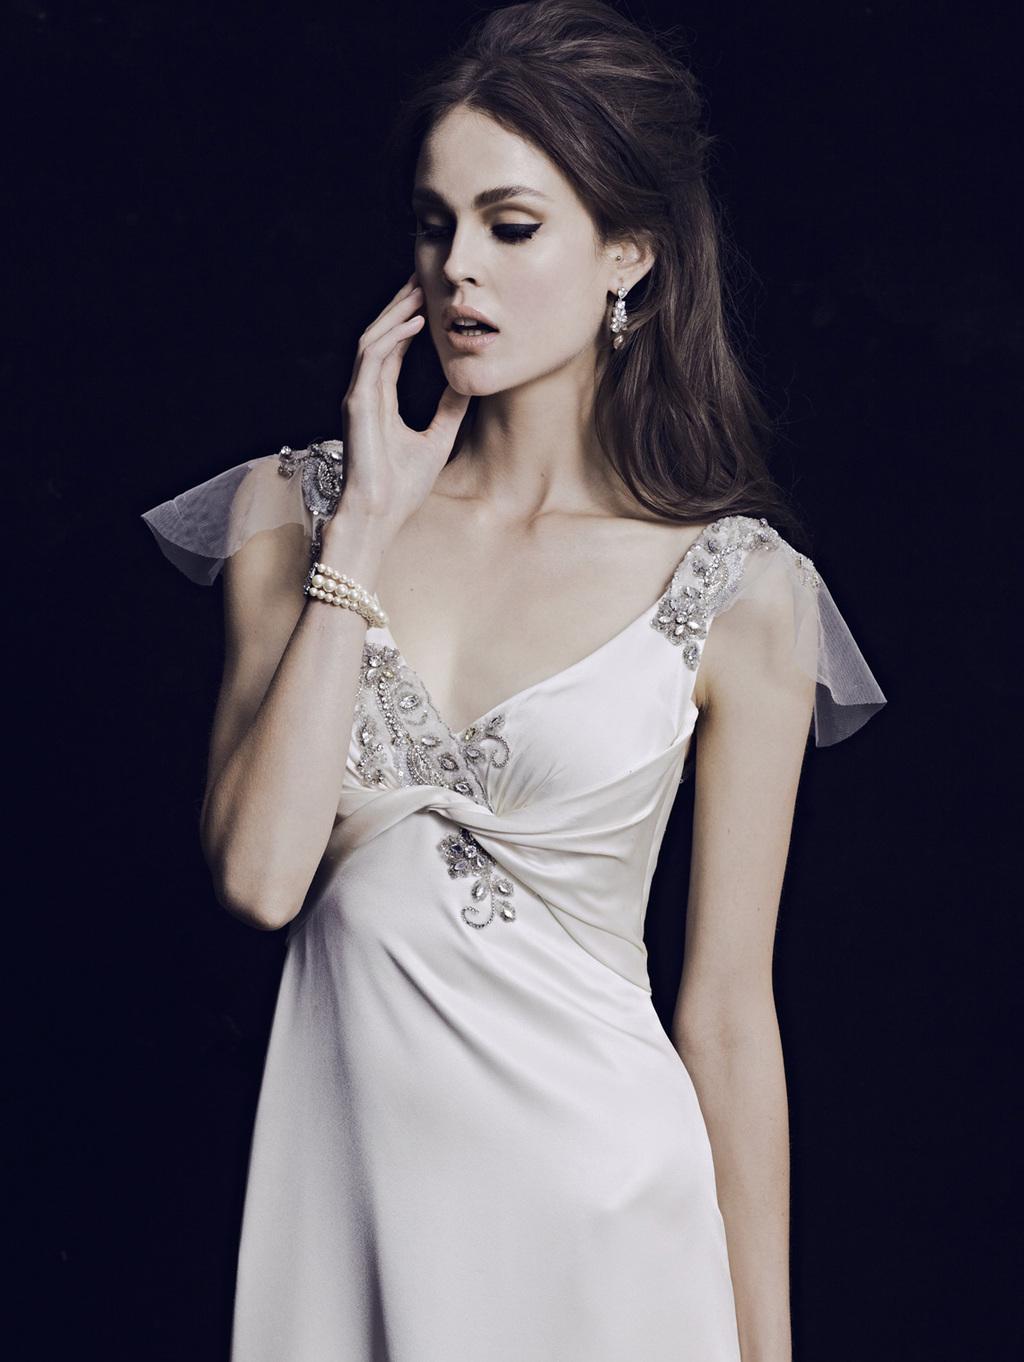 Mariana-hardwick-wedding-dress-2013-bridal-classic-5.full